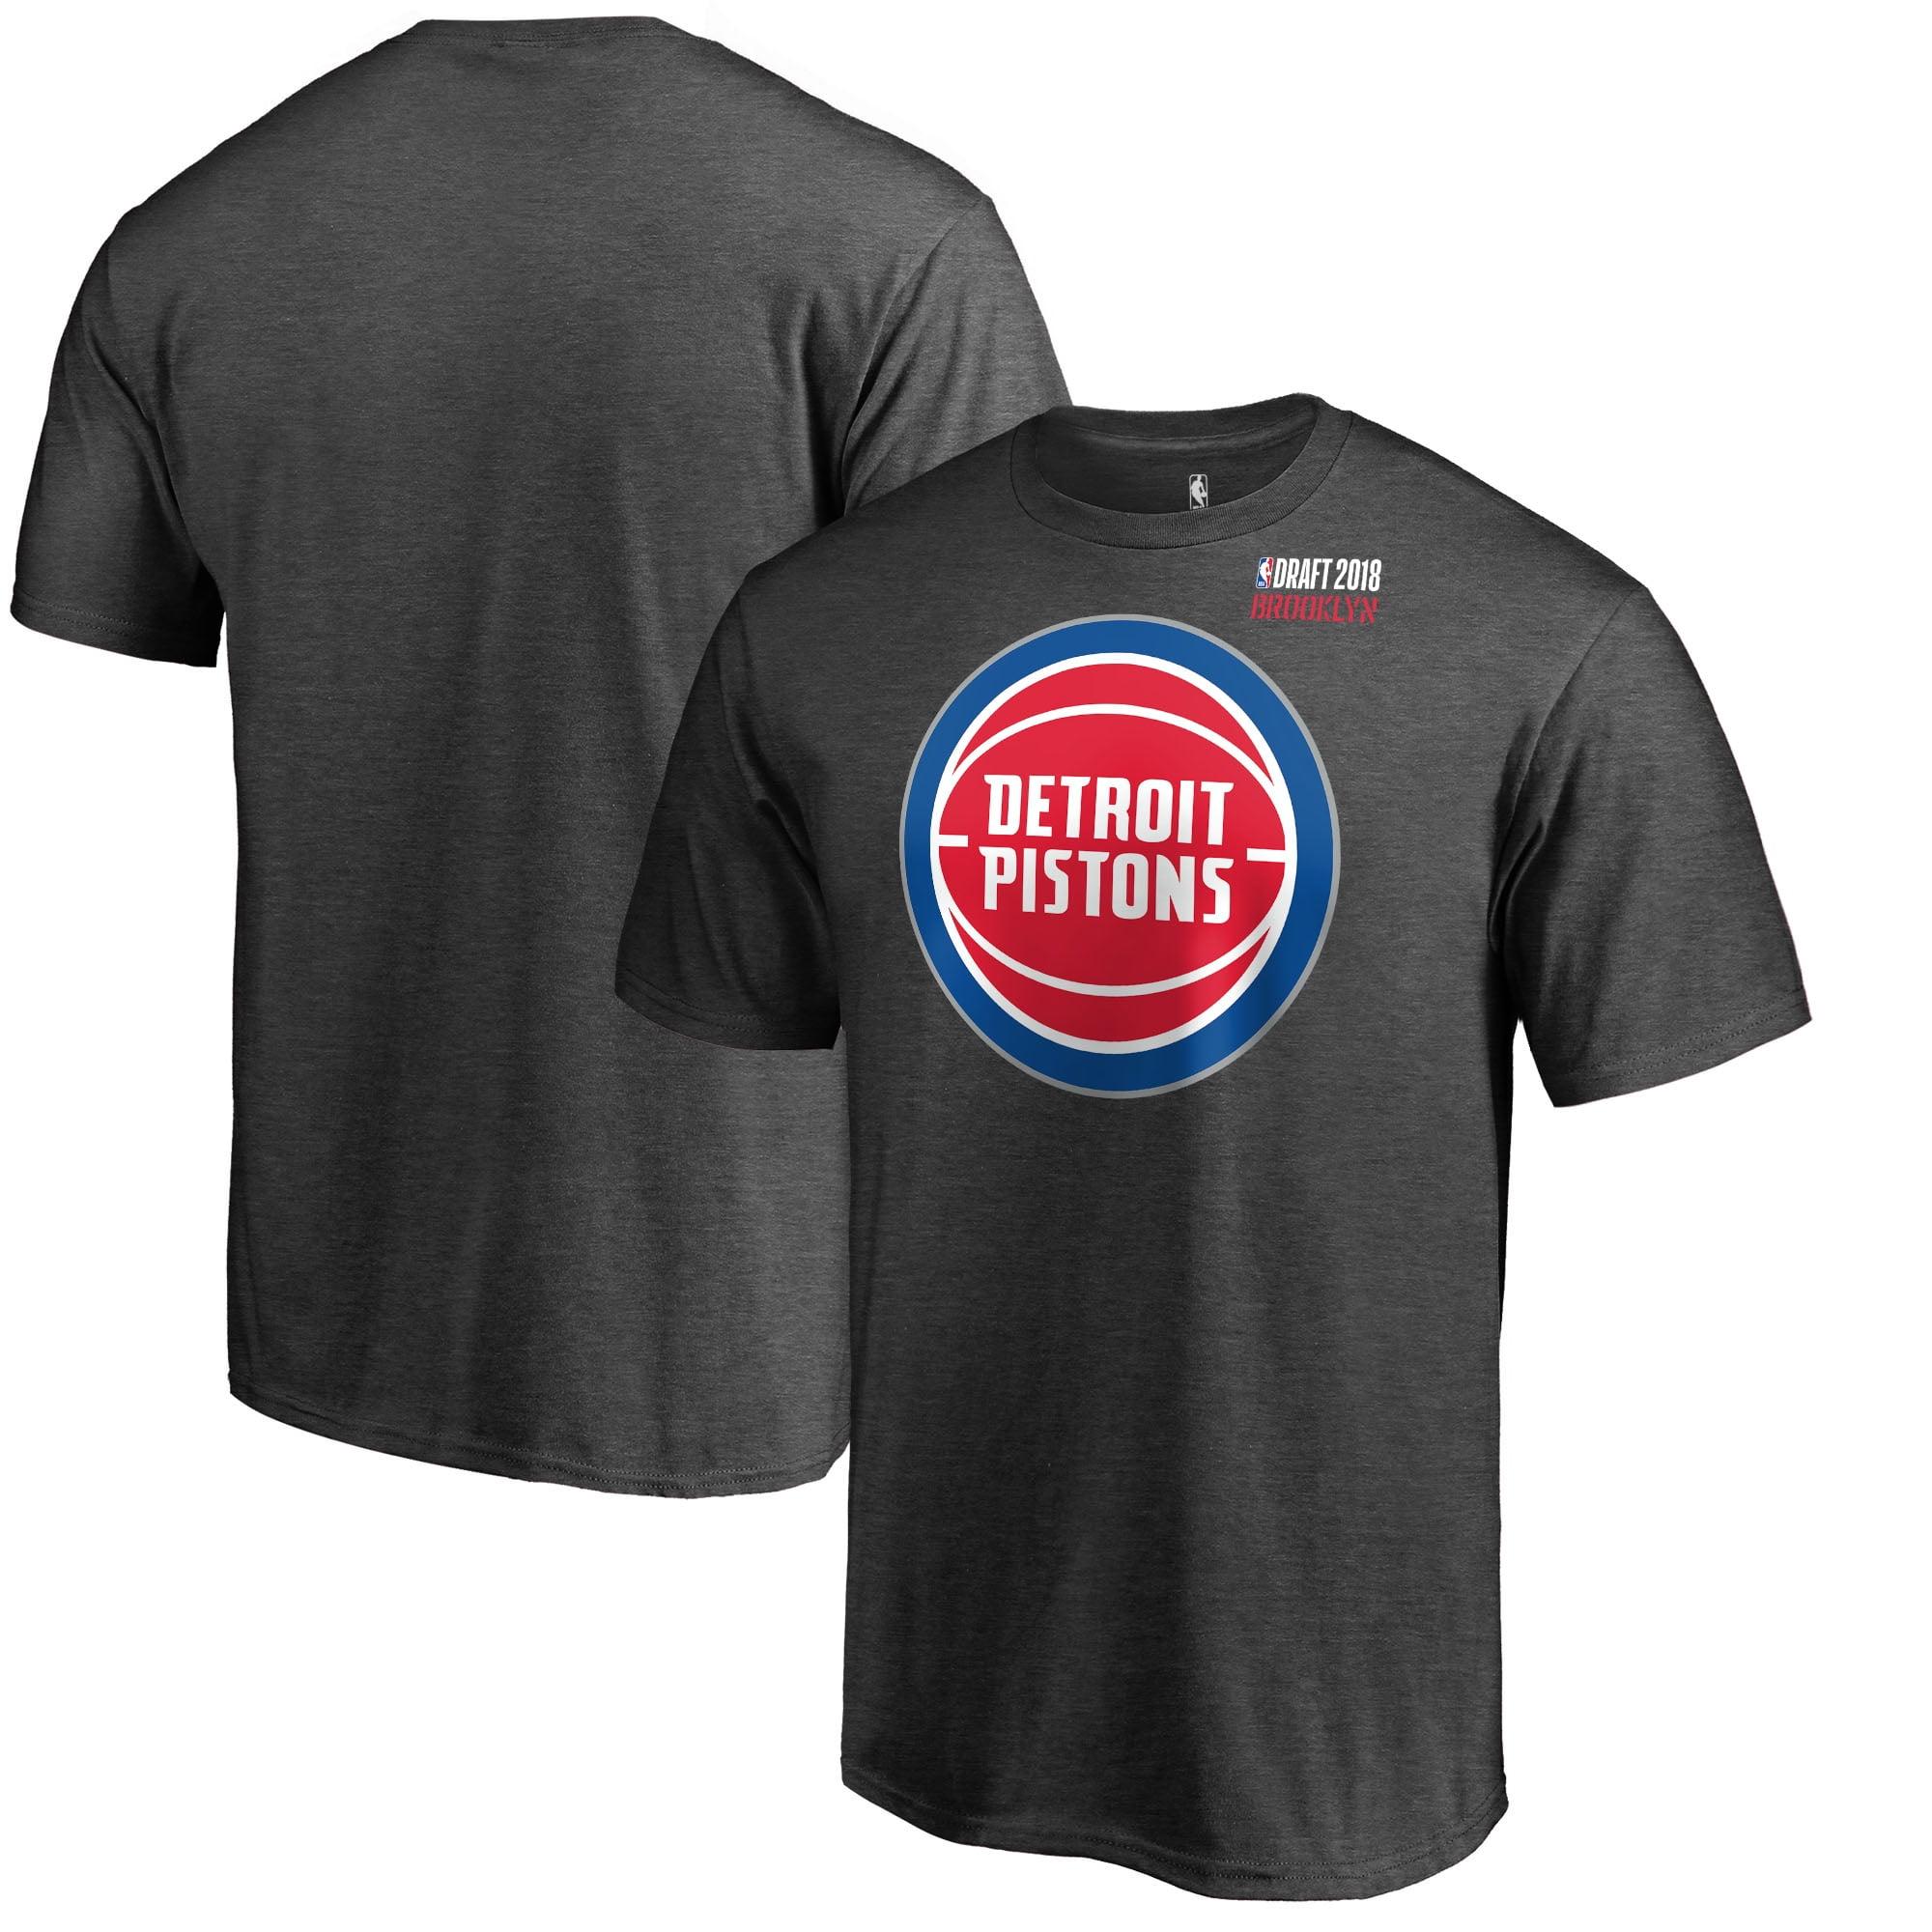 Detroit Pistons Fanatics Branded 2018 NBA Draft BKLYN T-Shirt - Heather Gray